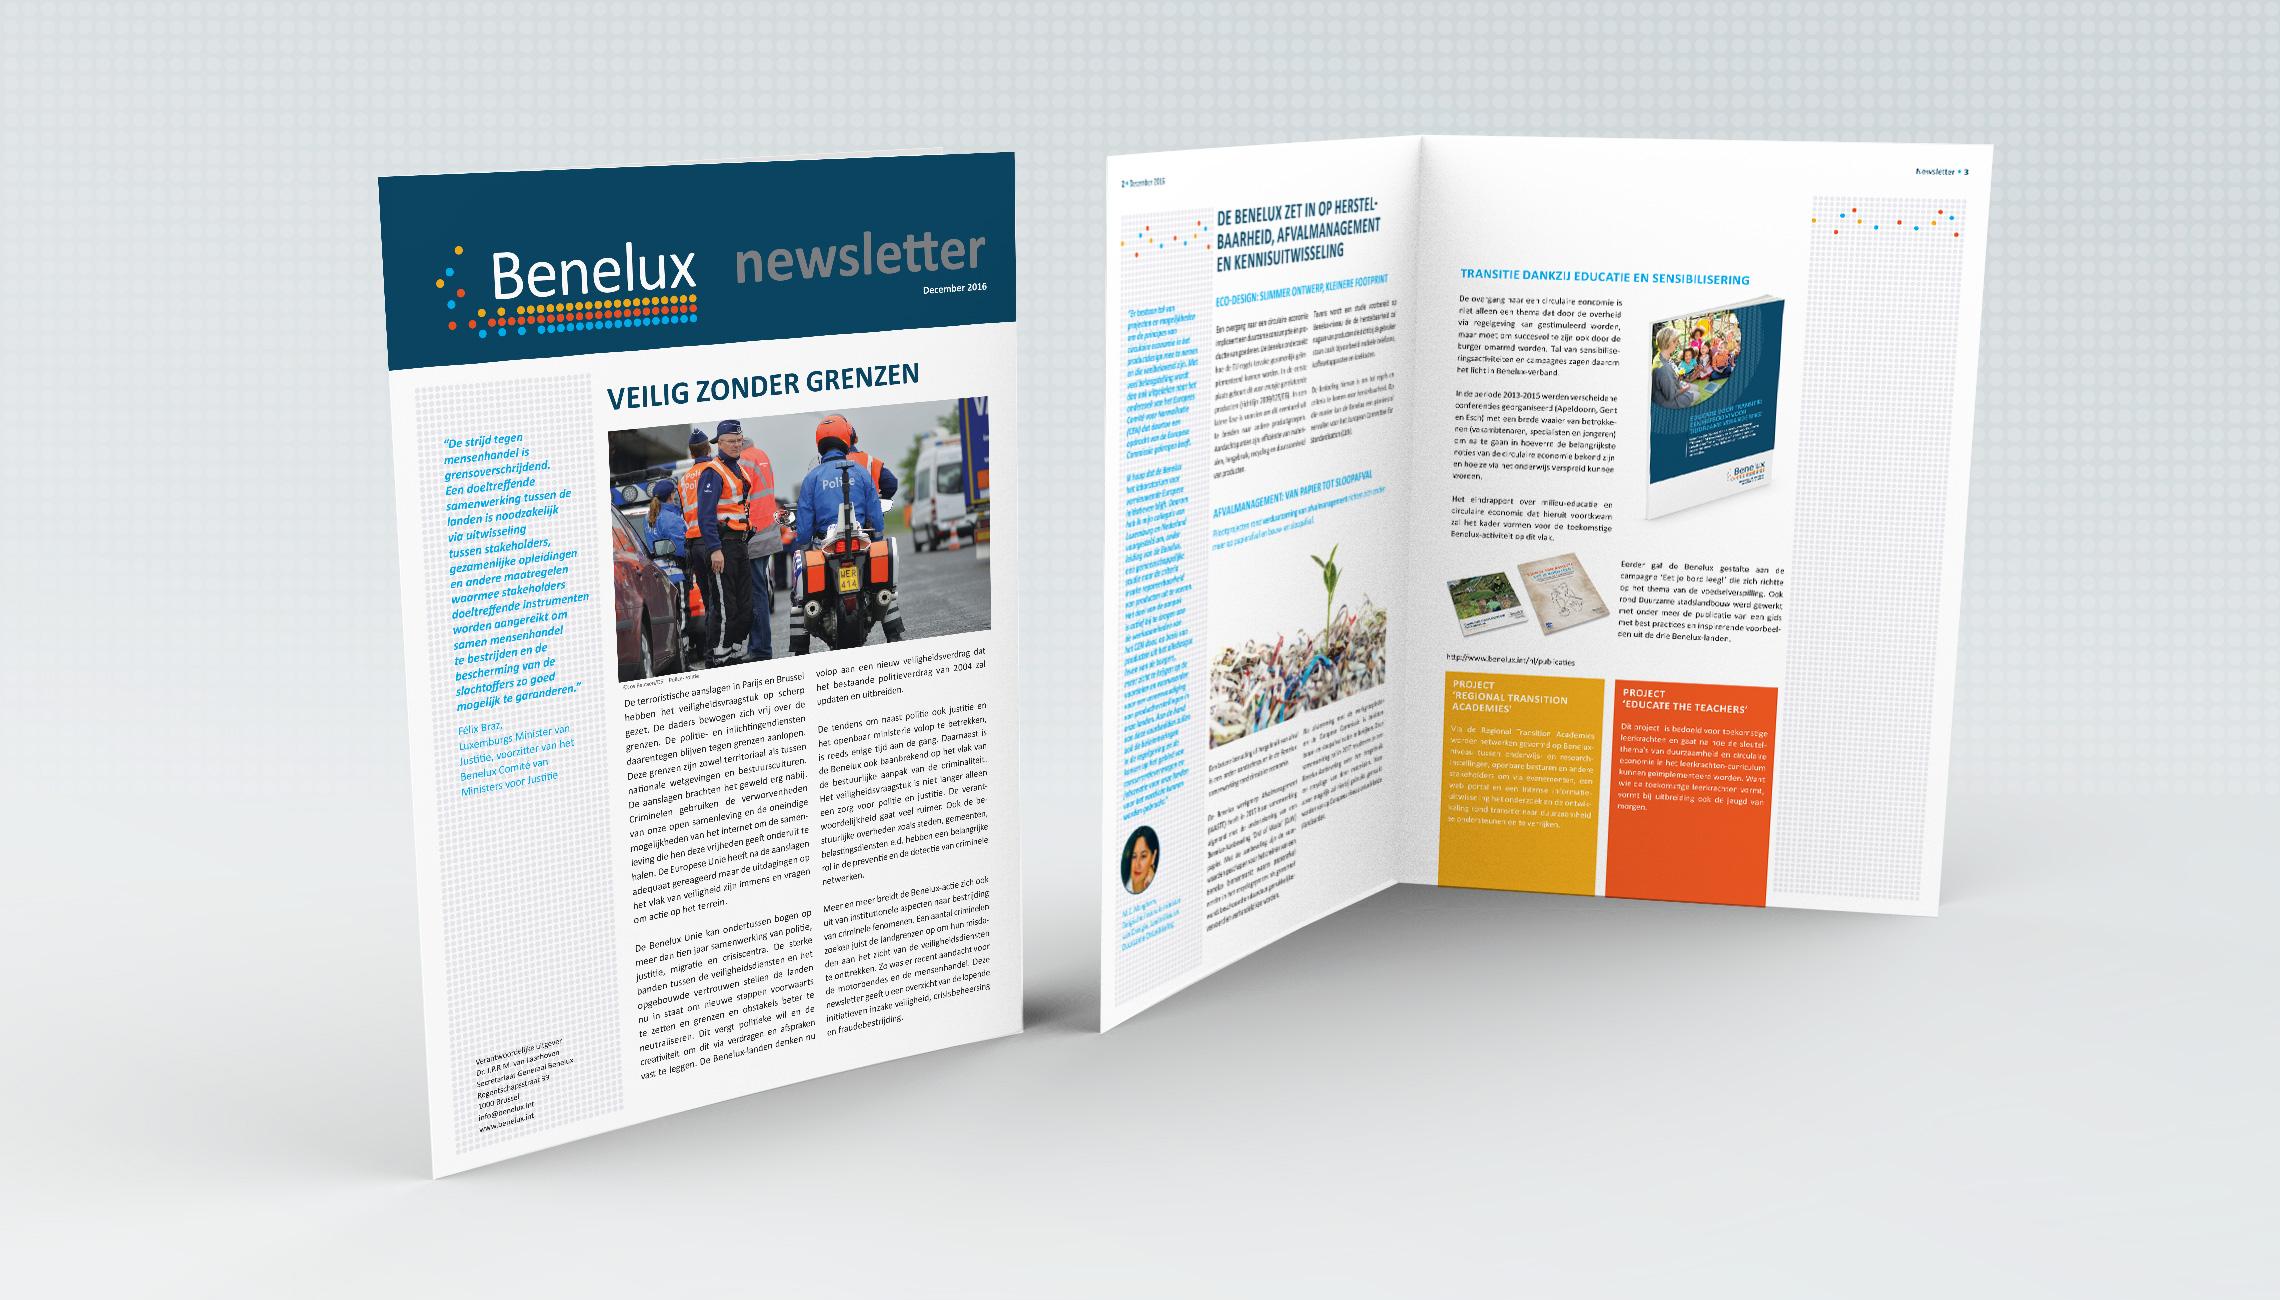 publication: Newsletter Benelux - image 2